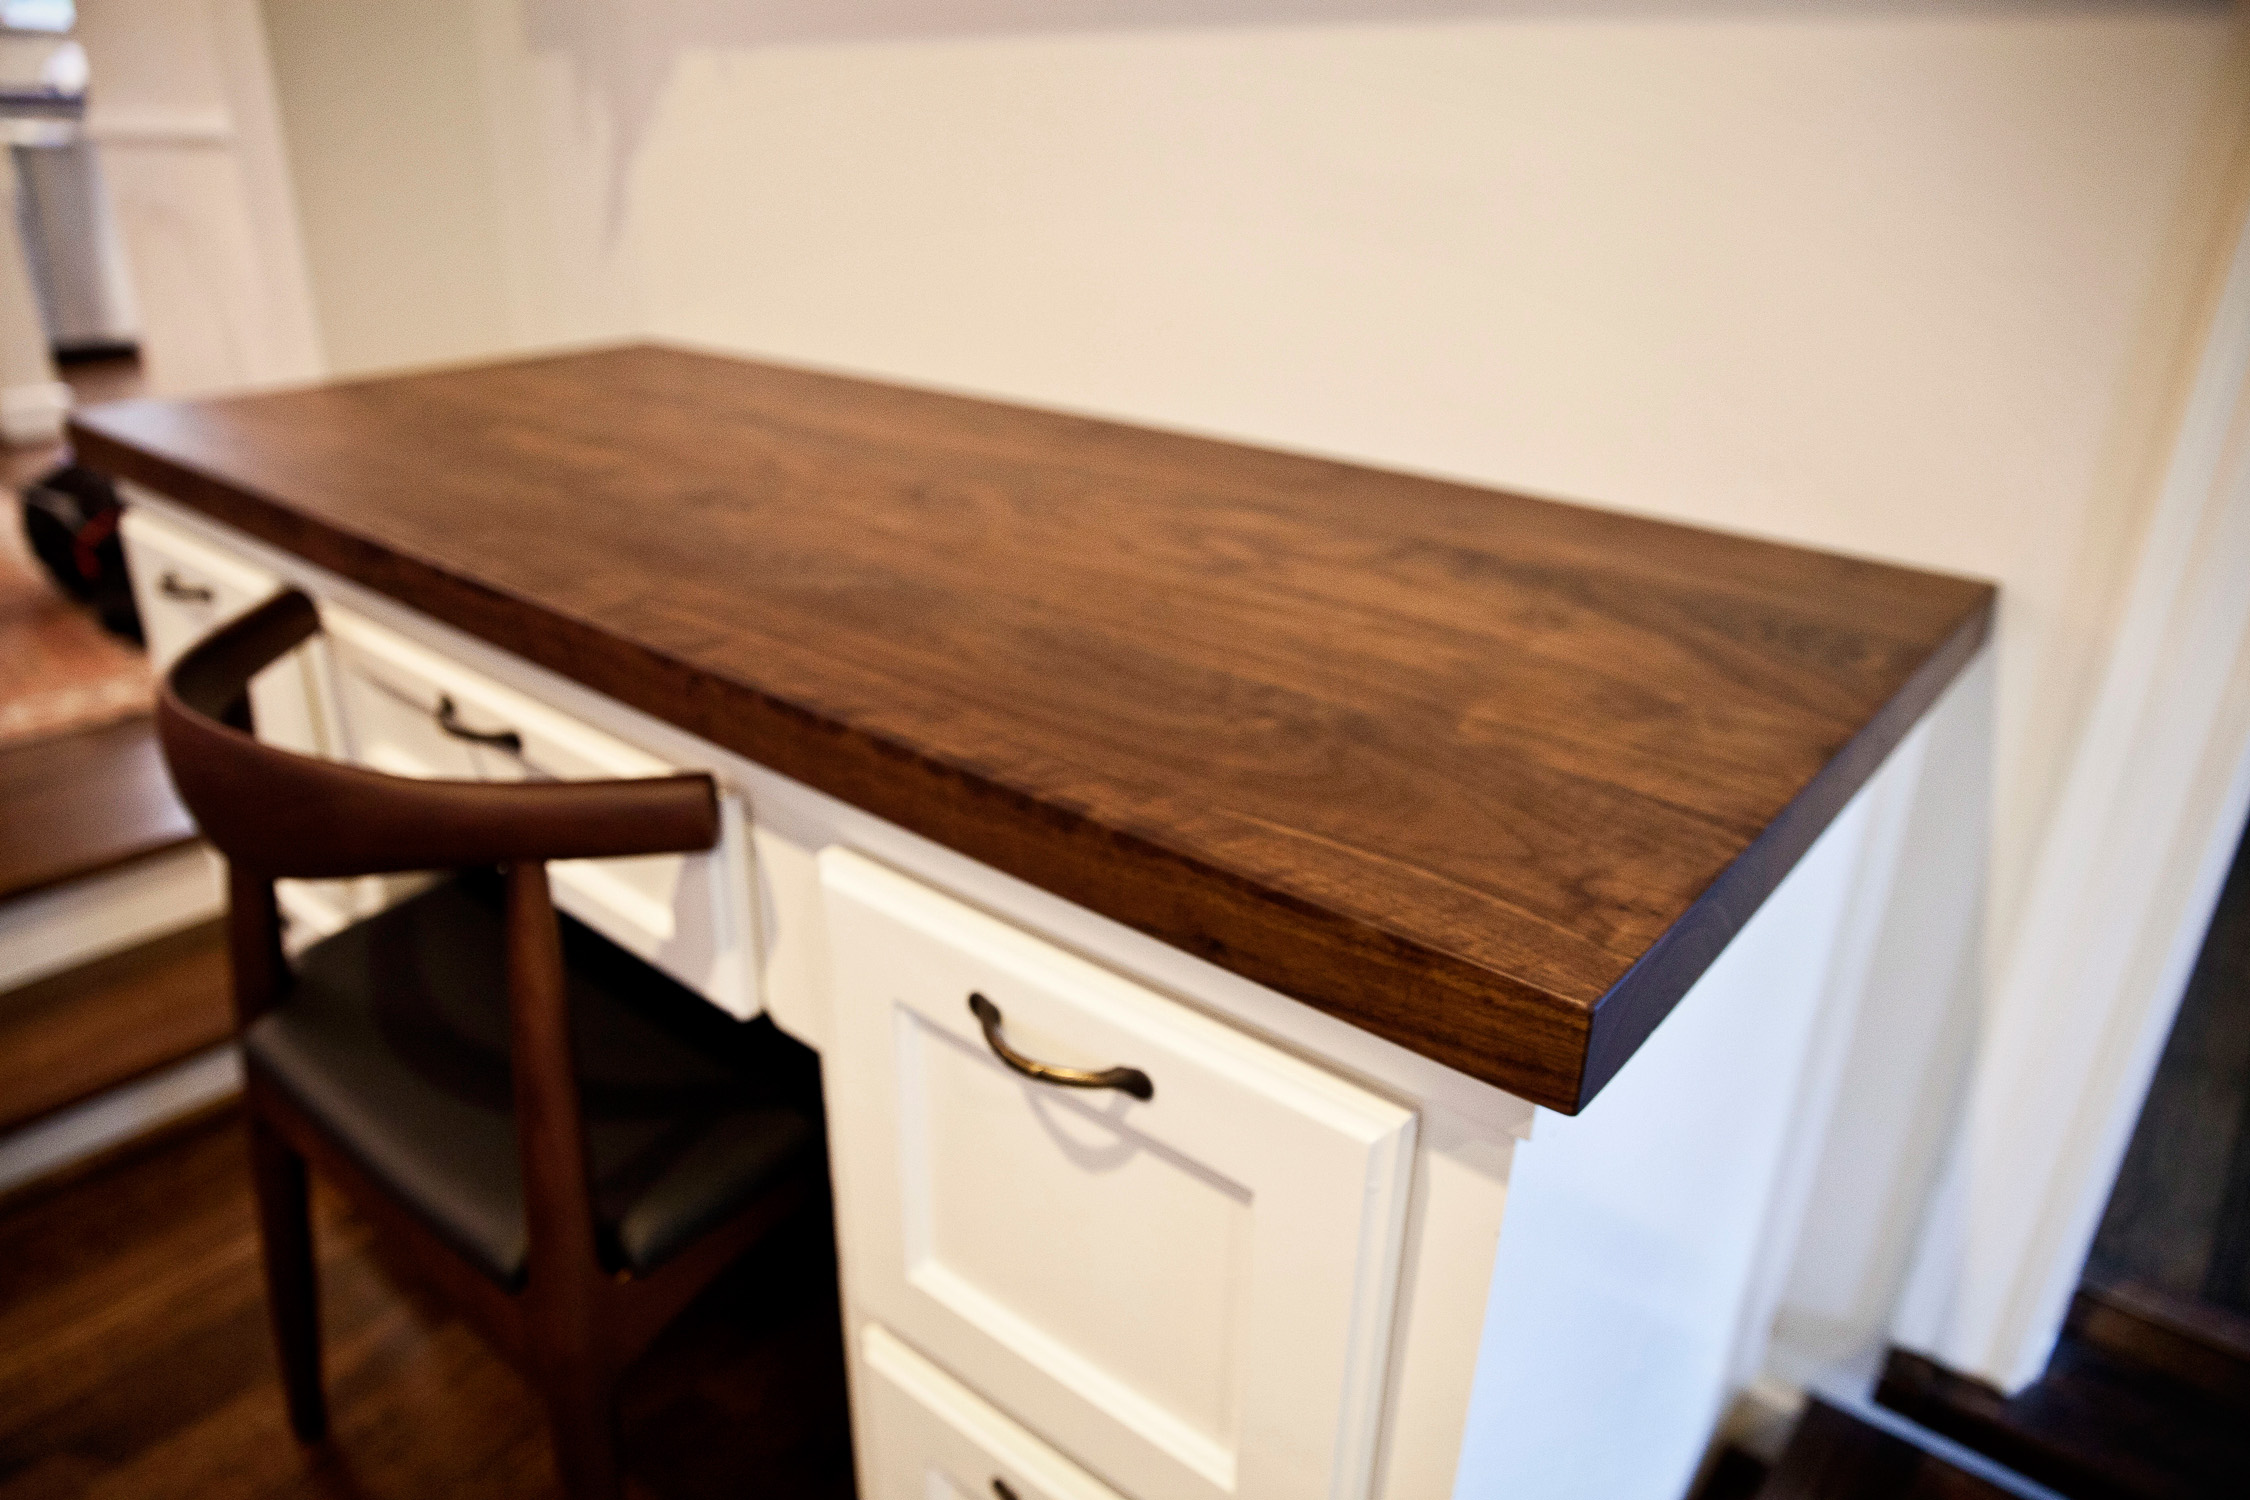 walnut kitchen island in west u install kitchen island Walnut Desk Top West University in Houston Texas